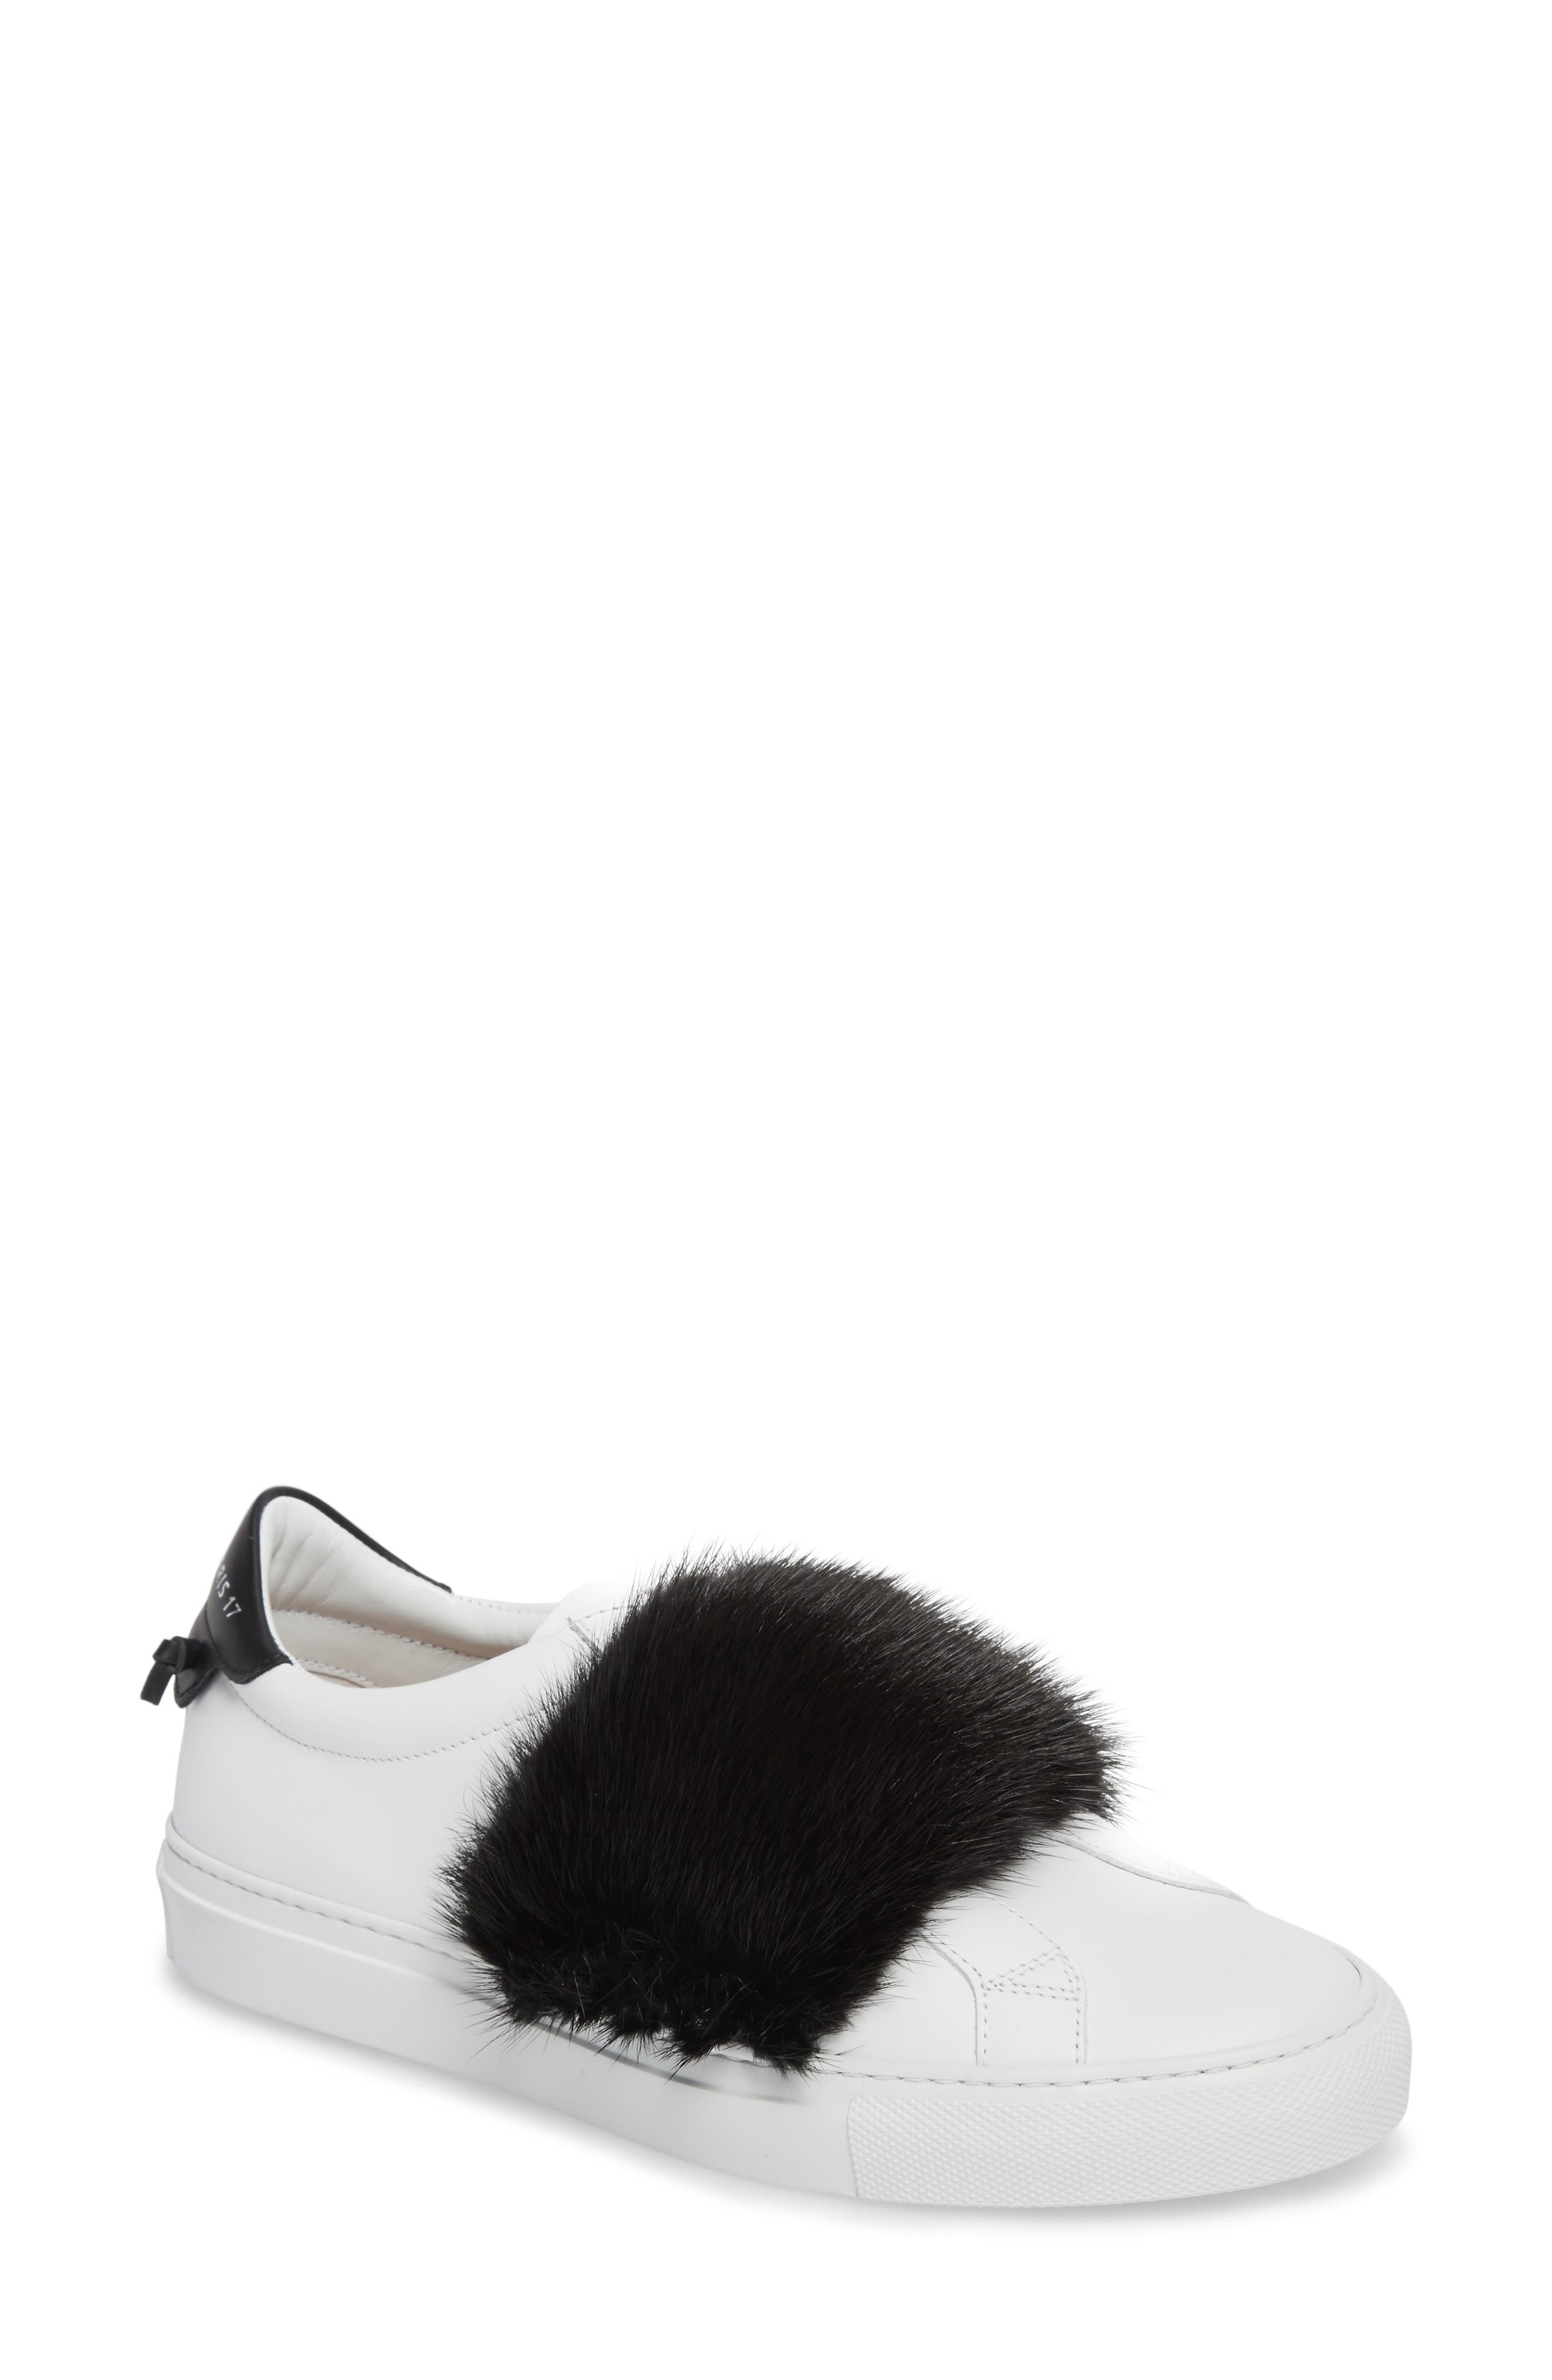 Urban Street Slip-On Sneaker with Genuine Mink Fur Trim,                             Main thumbnail 1, color,                             115